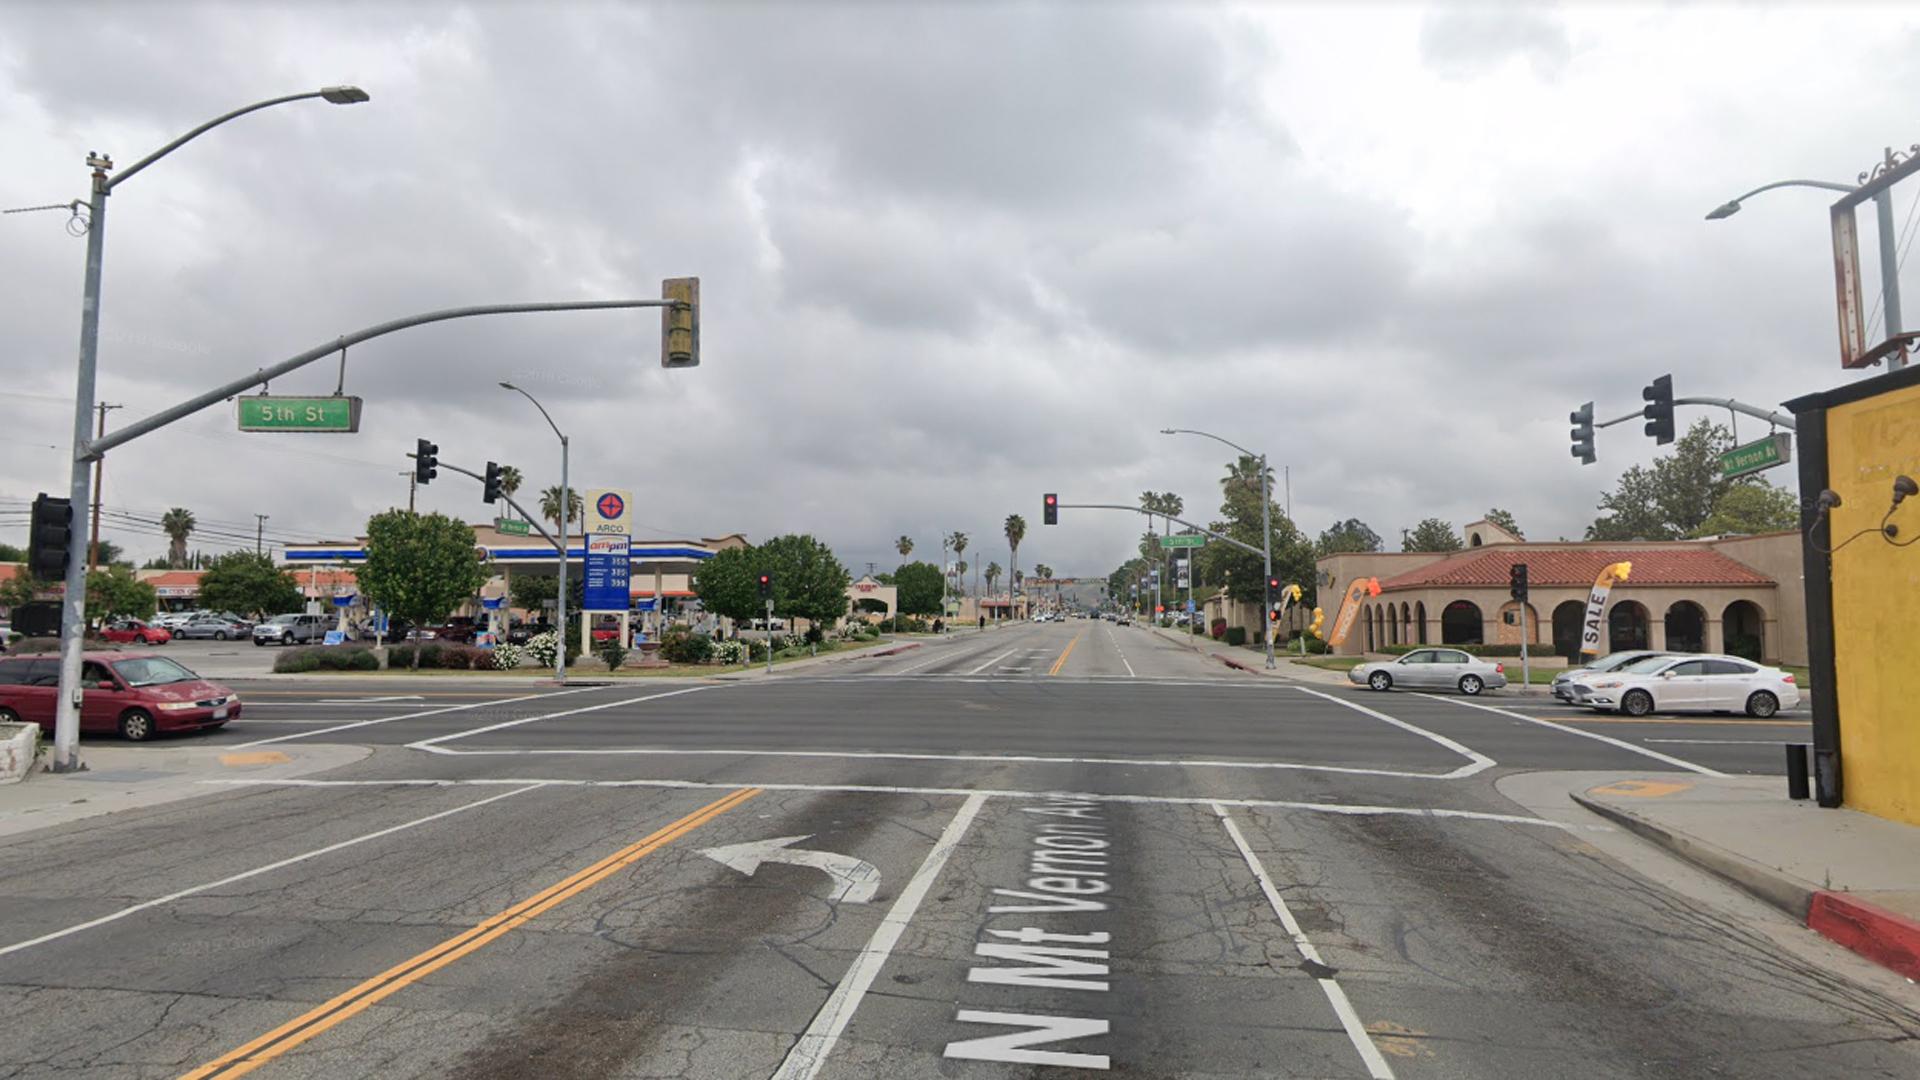 Man Accused Of Murder After Man Dies, Child Badly Injured In Throughout Court Calender Of San Bernardino Ca